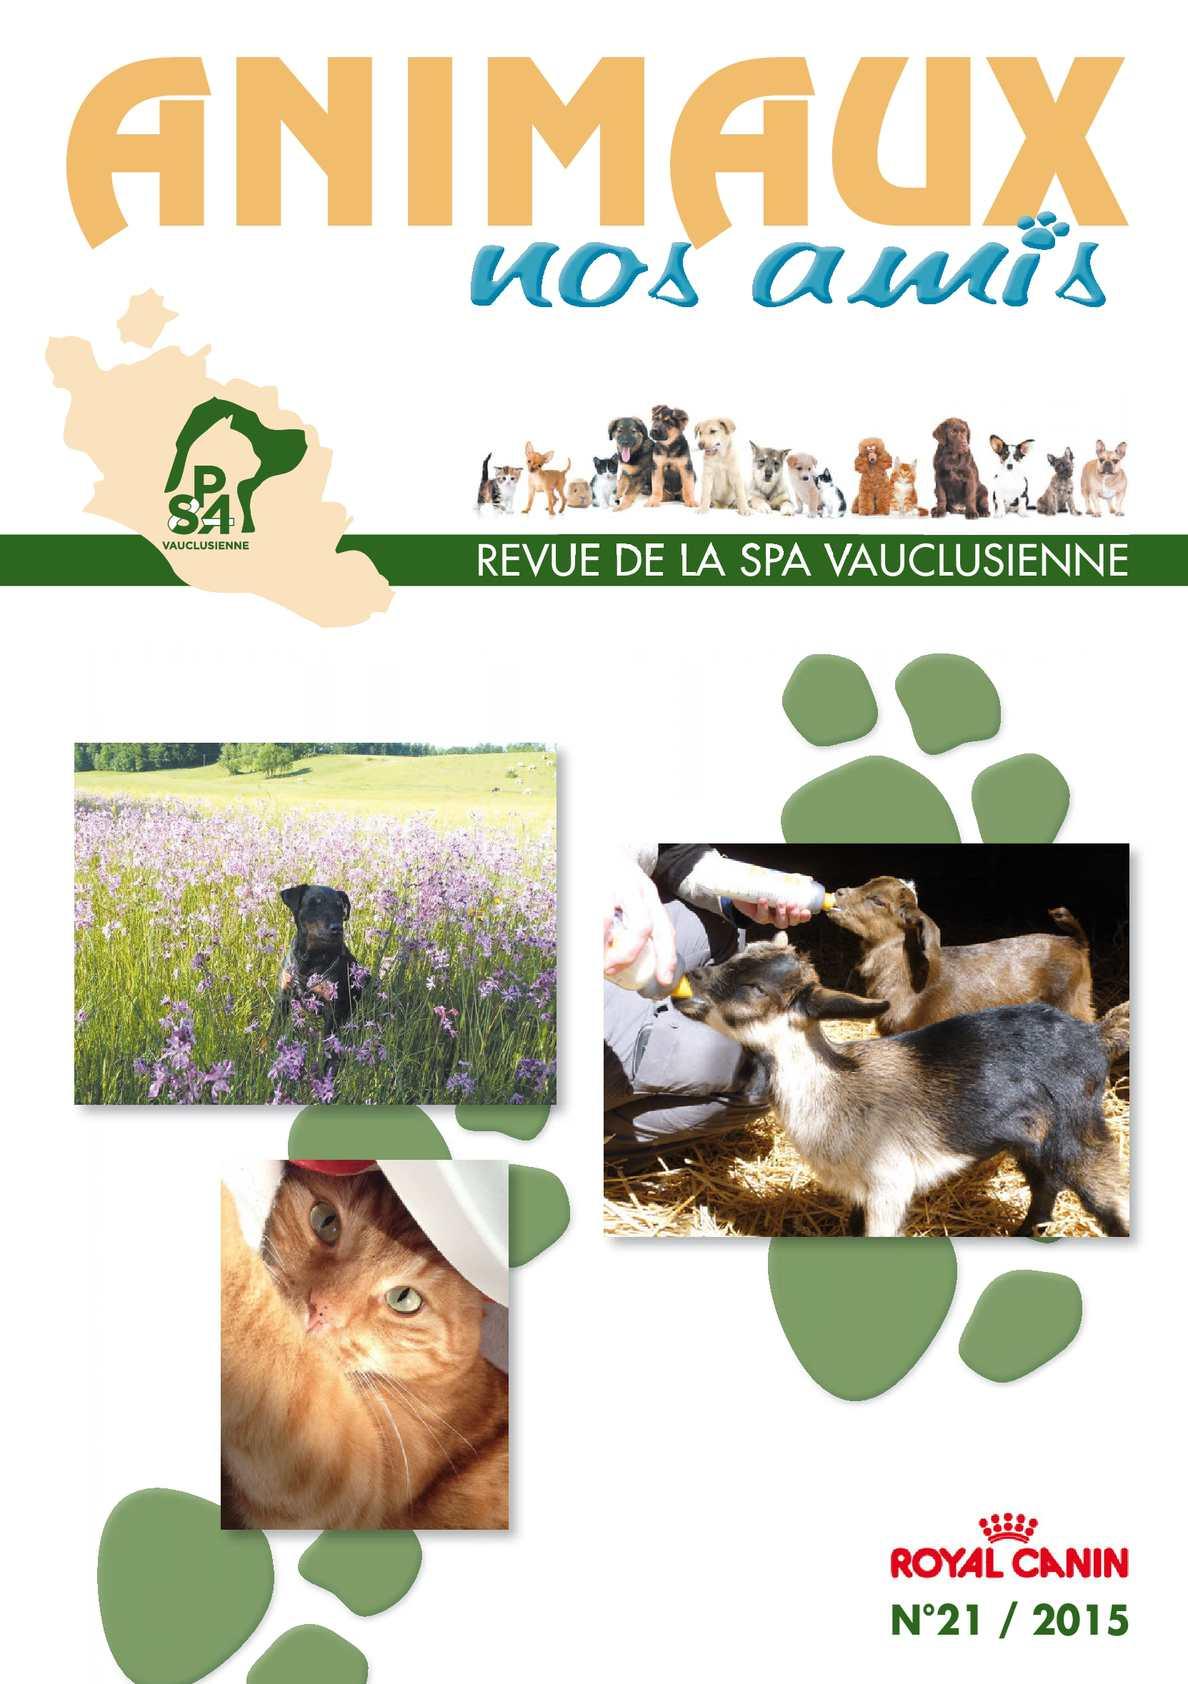 Calam o magazine animaux nos amis n 21 spa vauclusienne - Salon animaux avignon ...